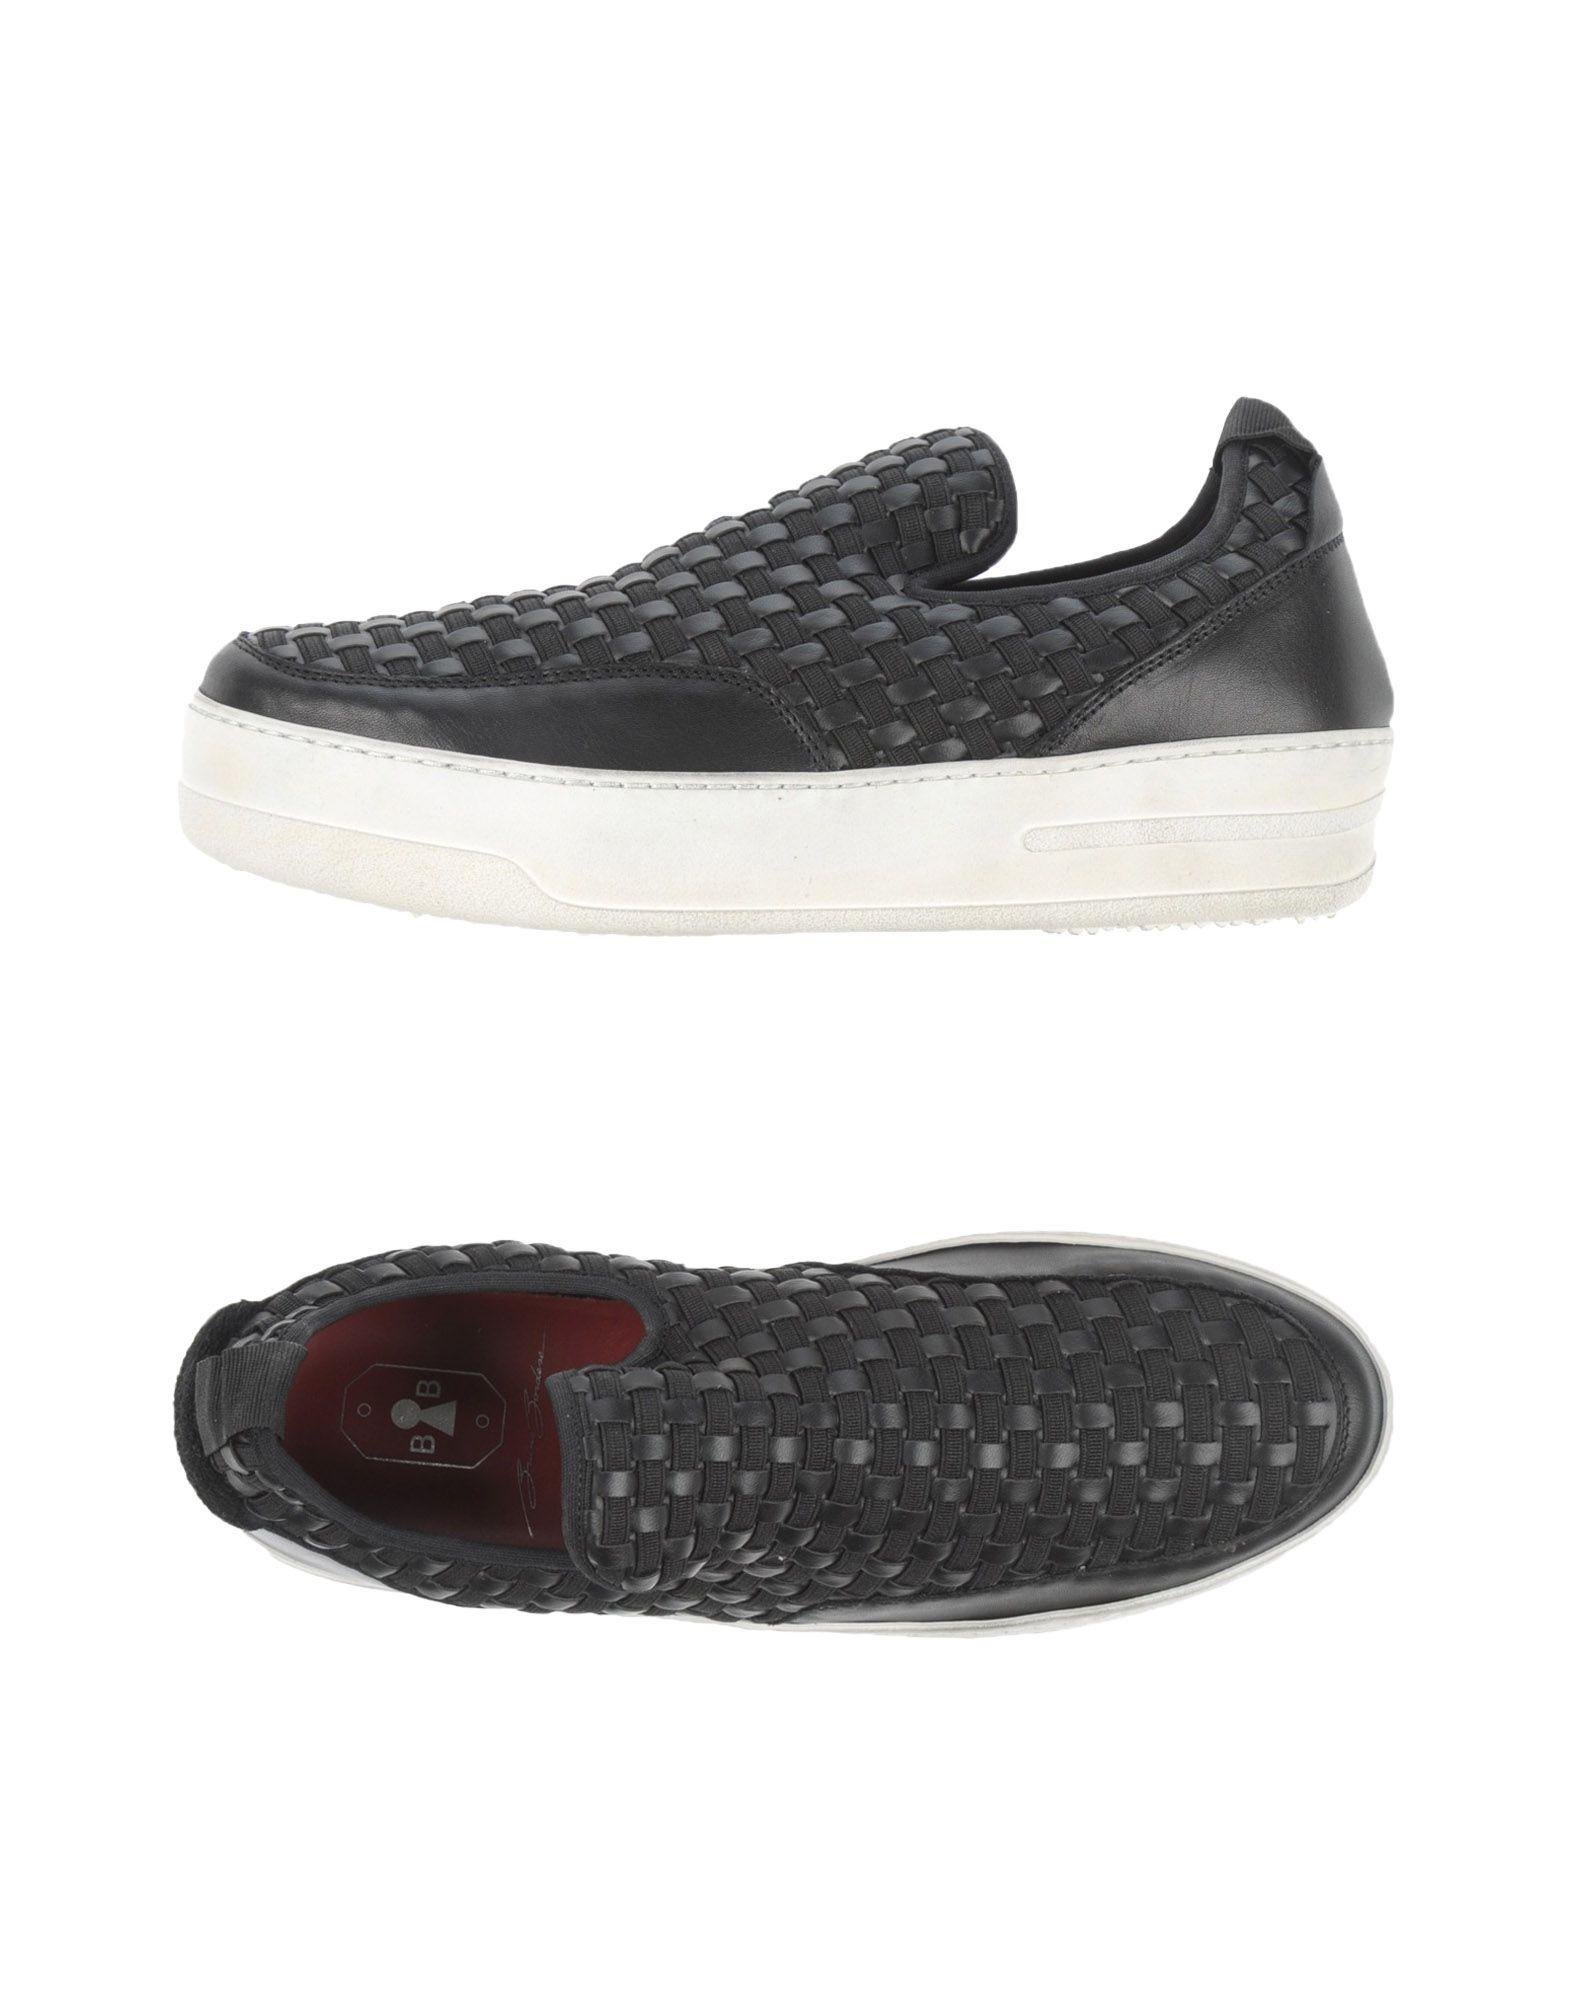 BRUNO BORDESE | BRUNO BORDESE Low-tops & sneakers | Goxip